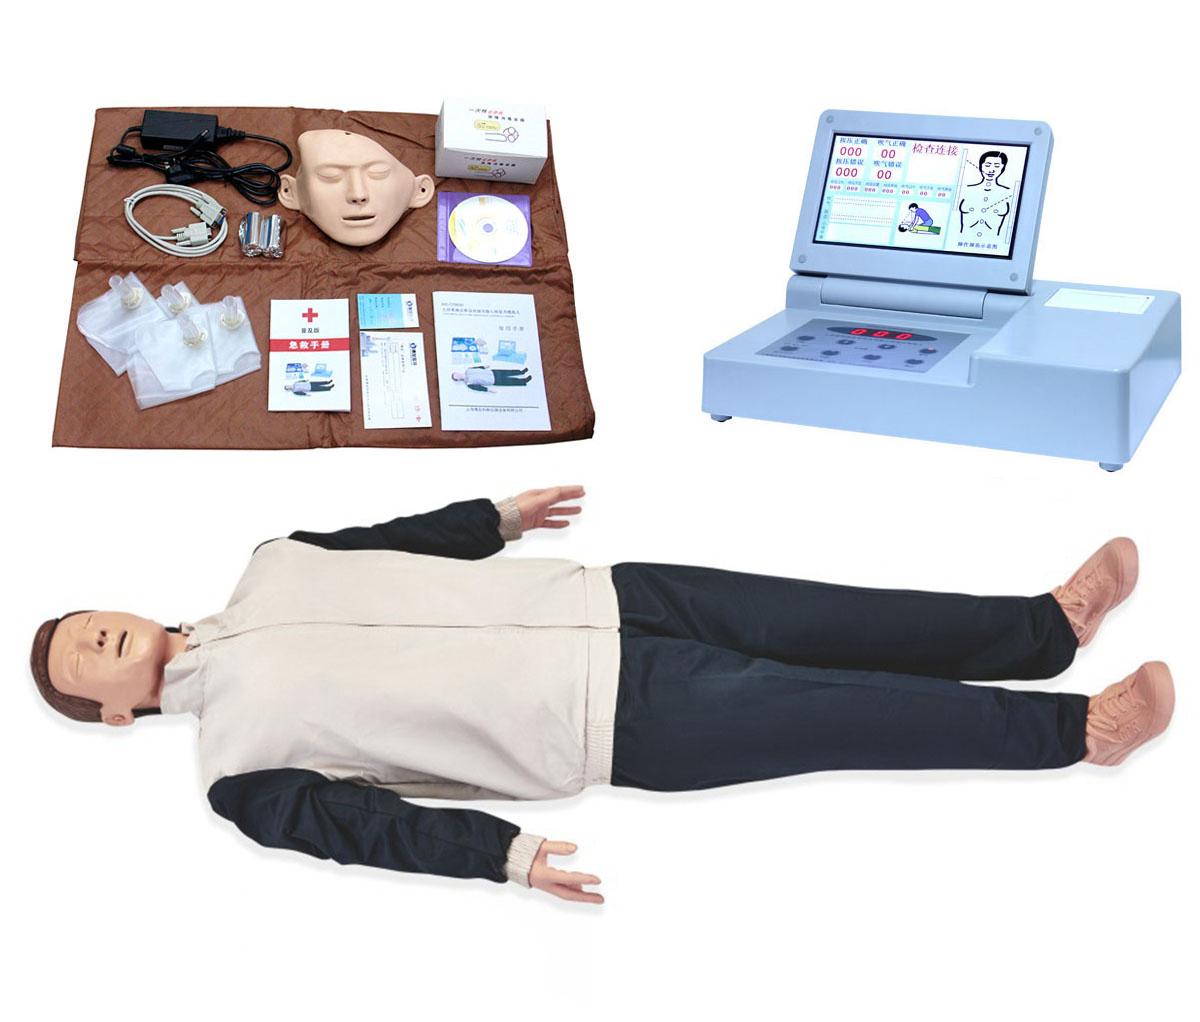 CPR690S大屏幕液晶彩显高级电脑心肺复苏模拟人